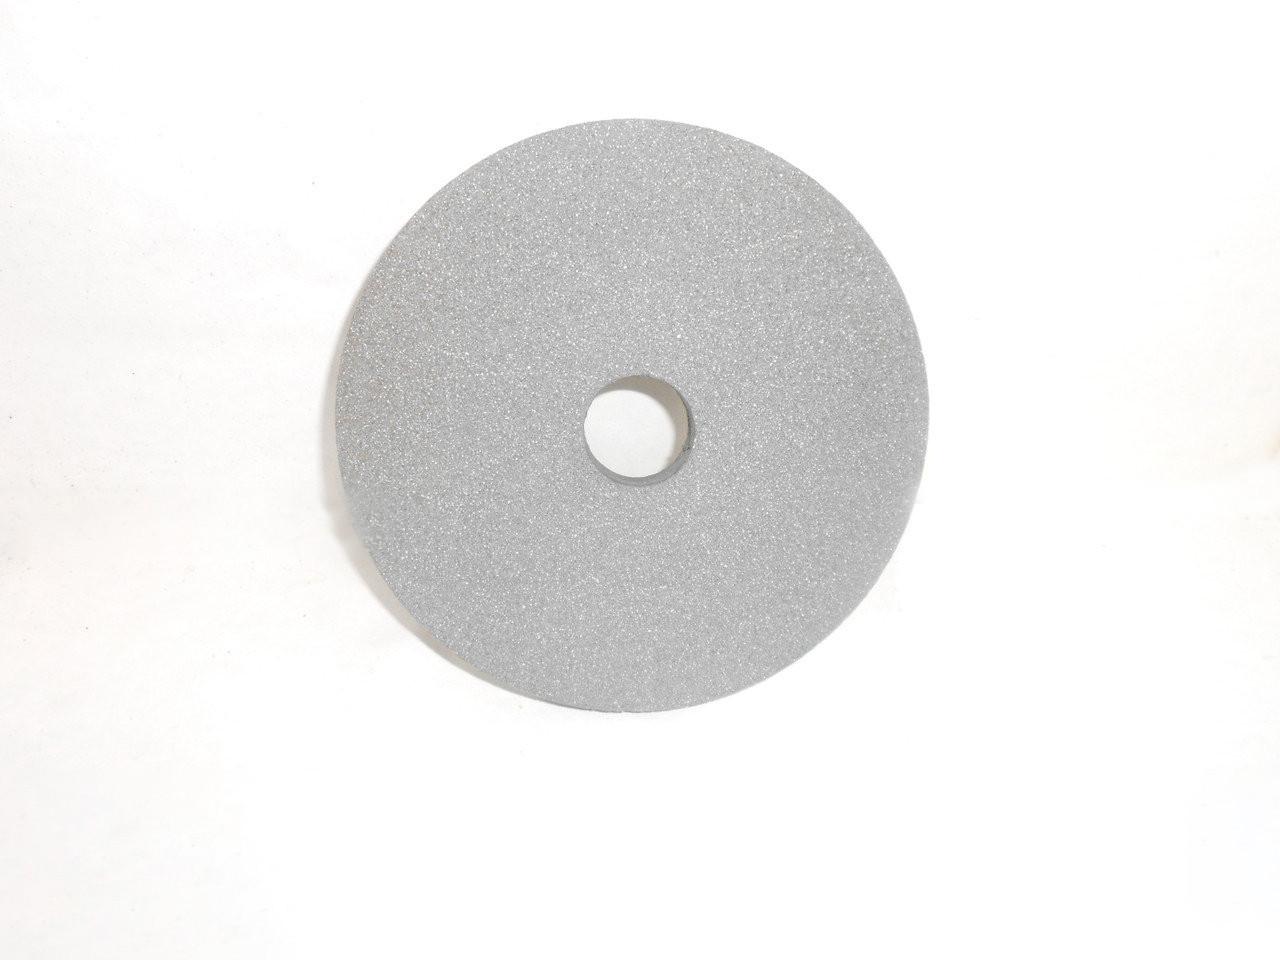 Круг шлифовальный 14А ПП 750х25х305  25 СМ